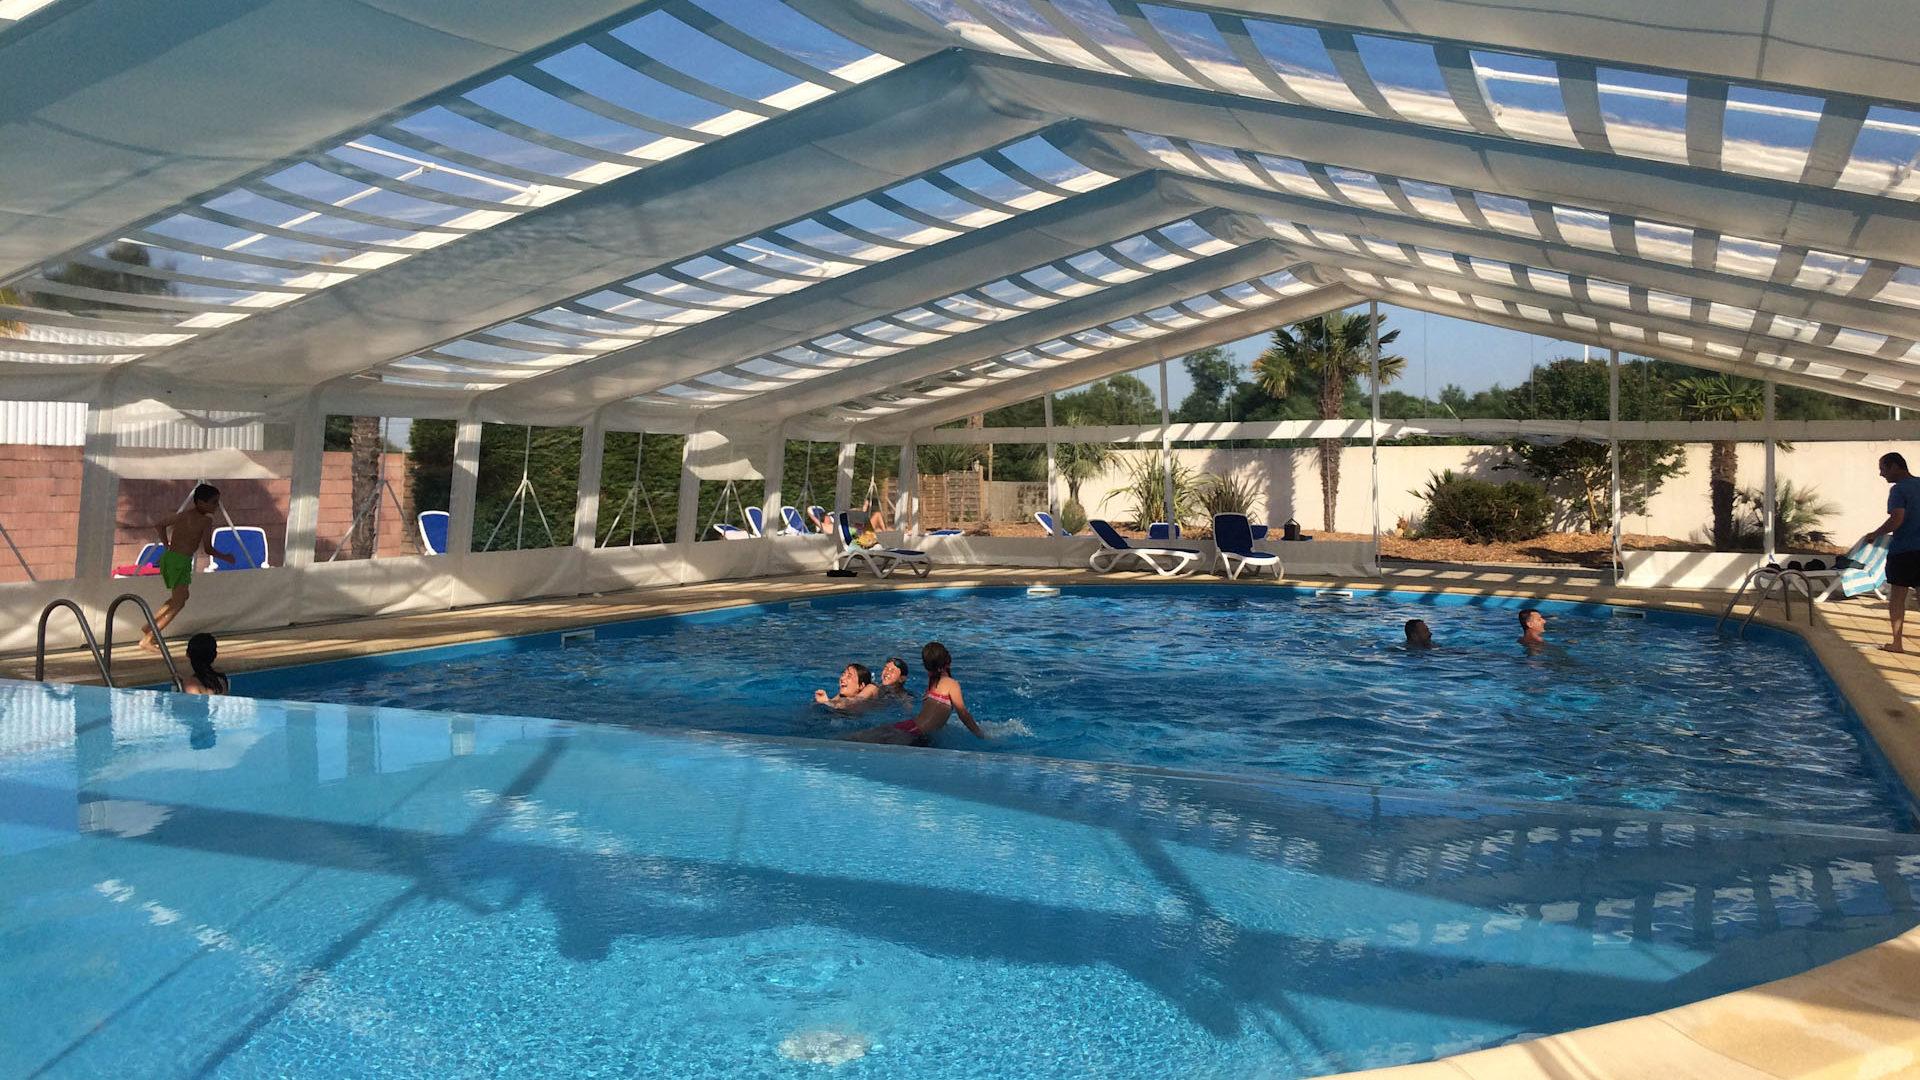 Camping en Charente Maritime avec piscine couverte